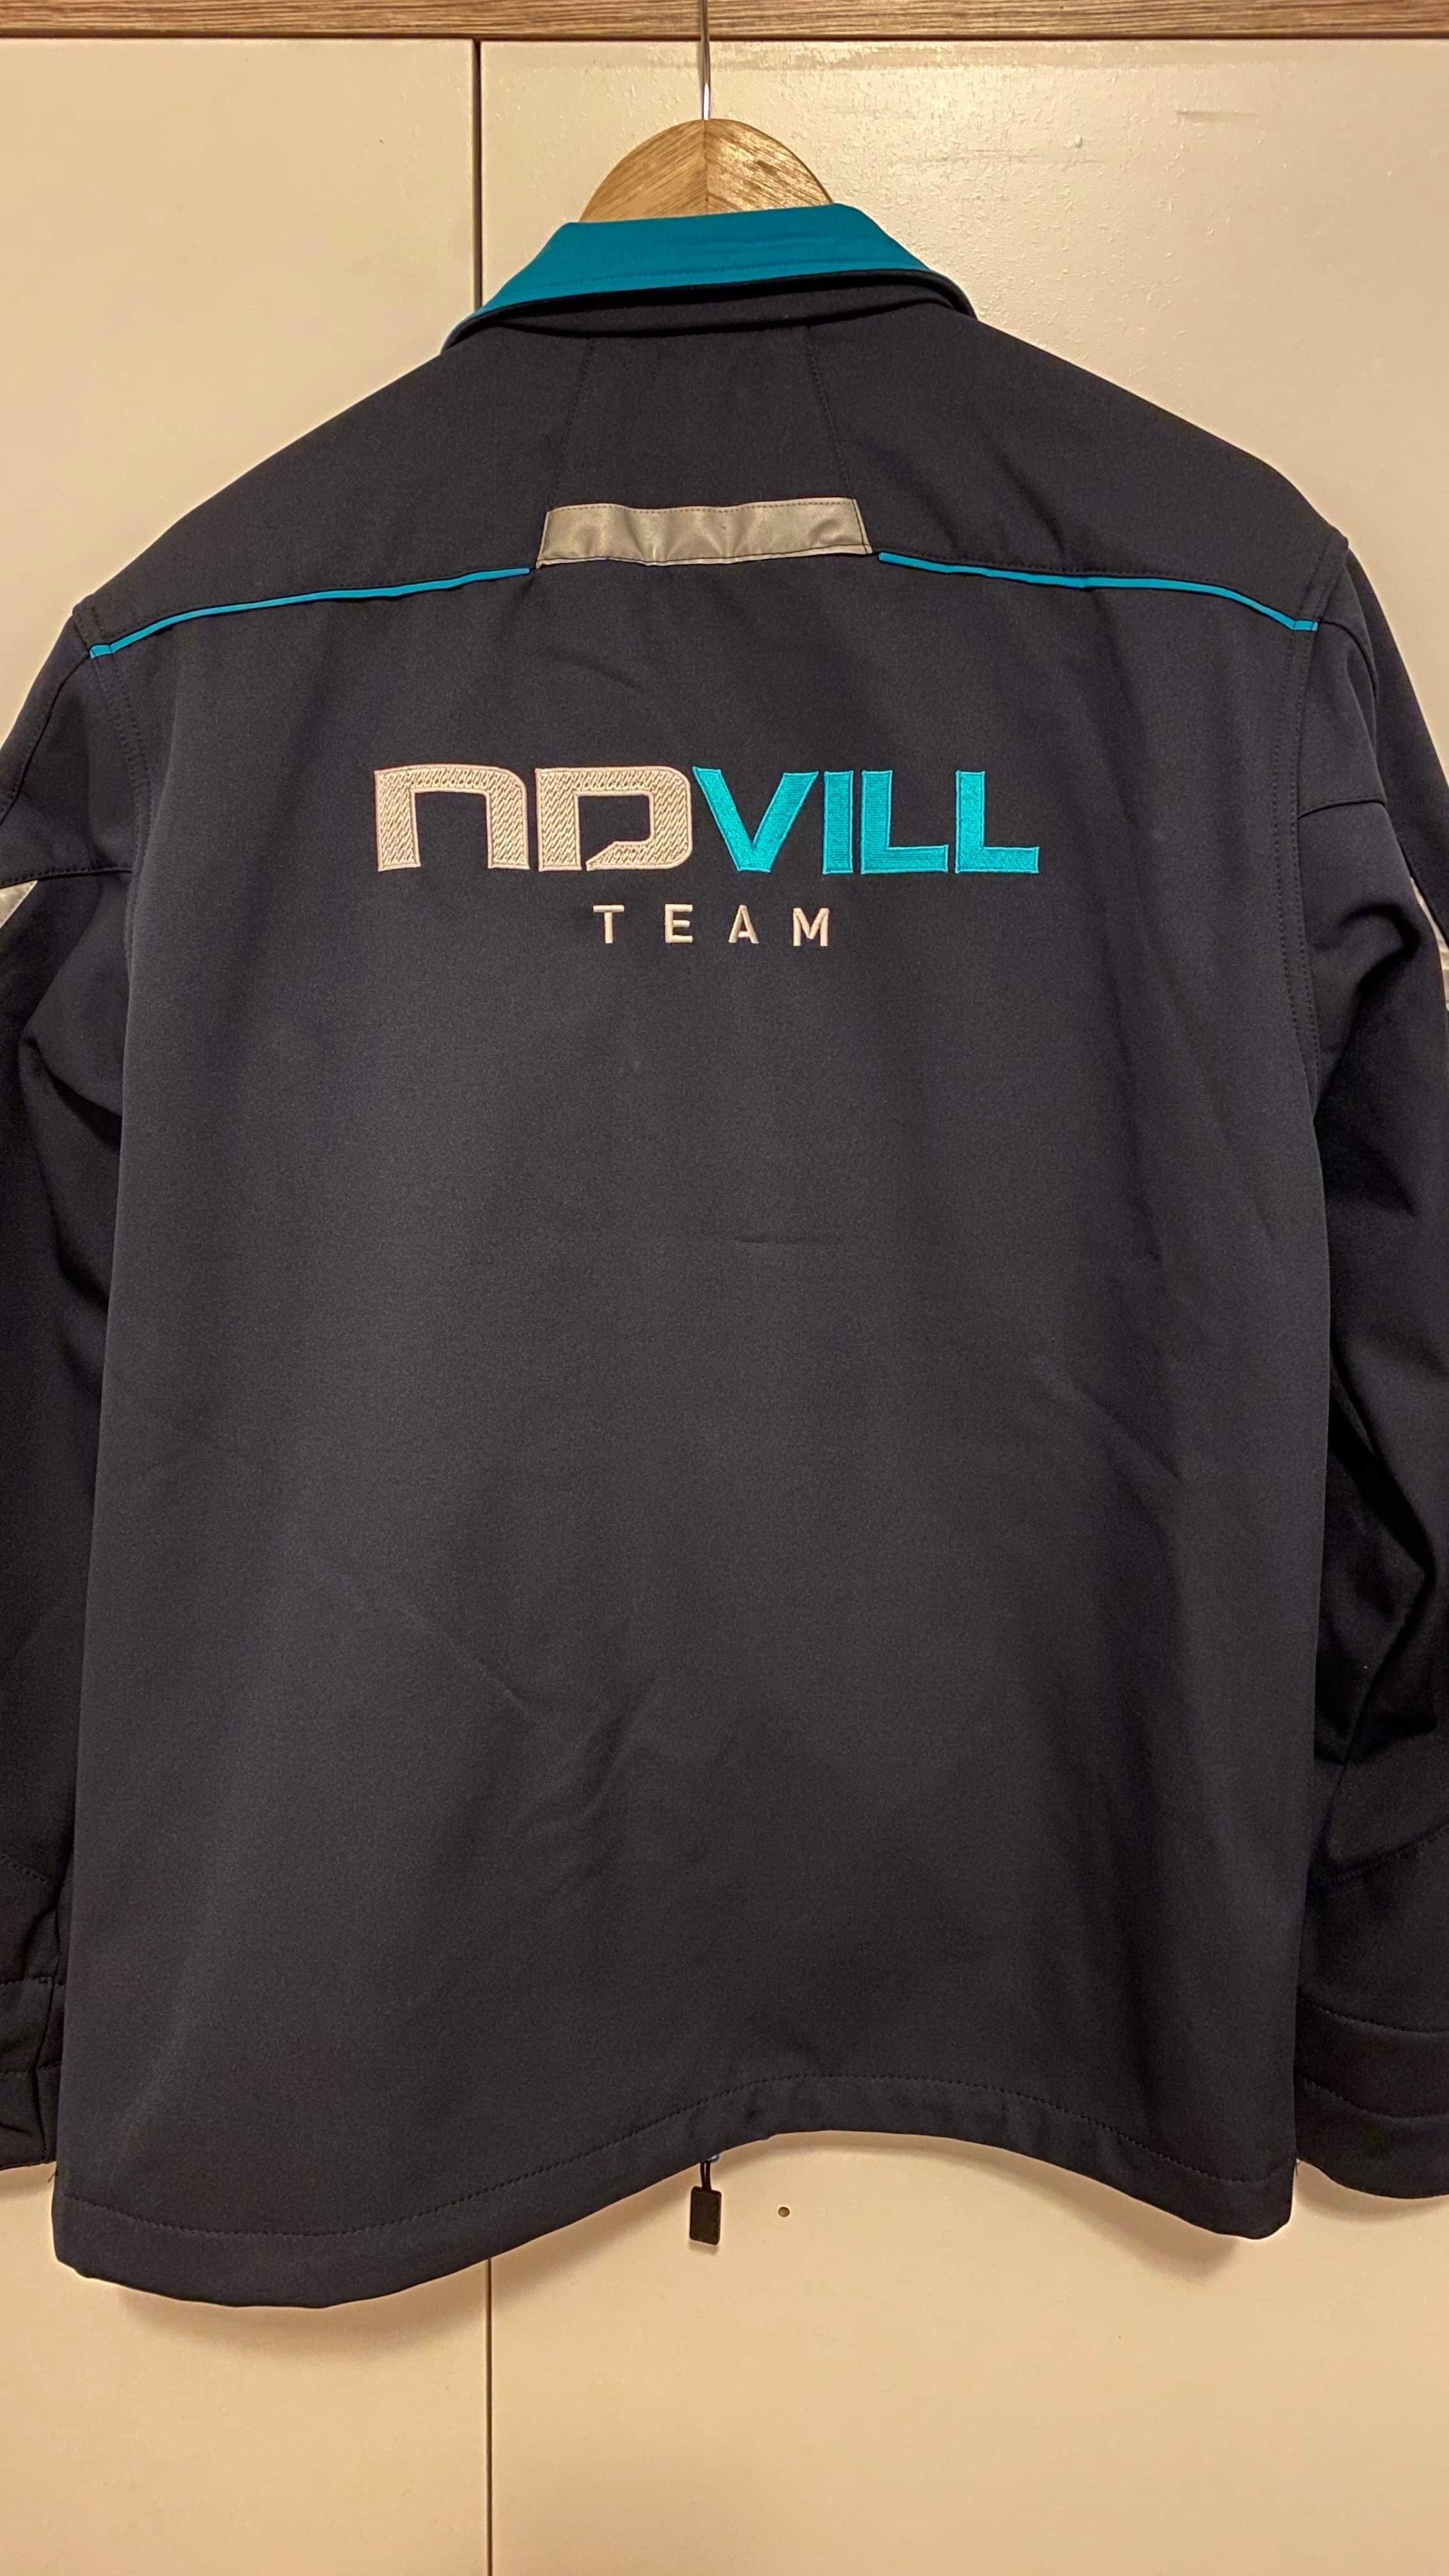 NDVILL Team softshell dzseki hátul